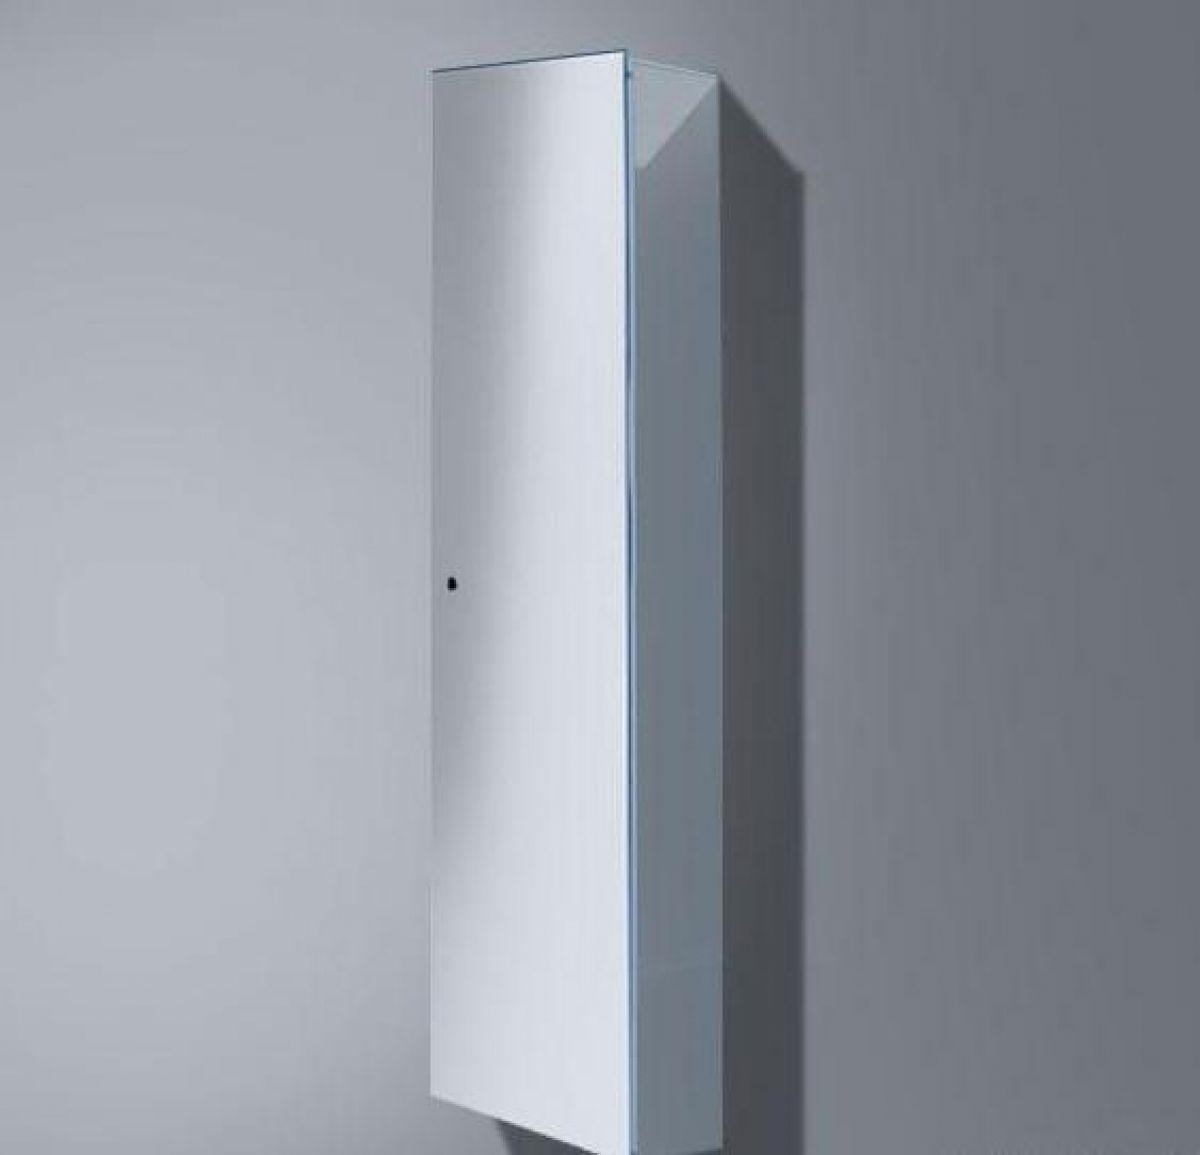 keuco royal 30 tall mirror cabinet uk bathrooms. Black Bedroom Furniture Sets. Home Design Ideas